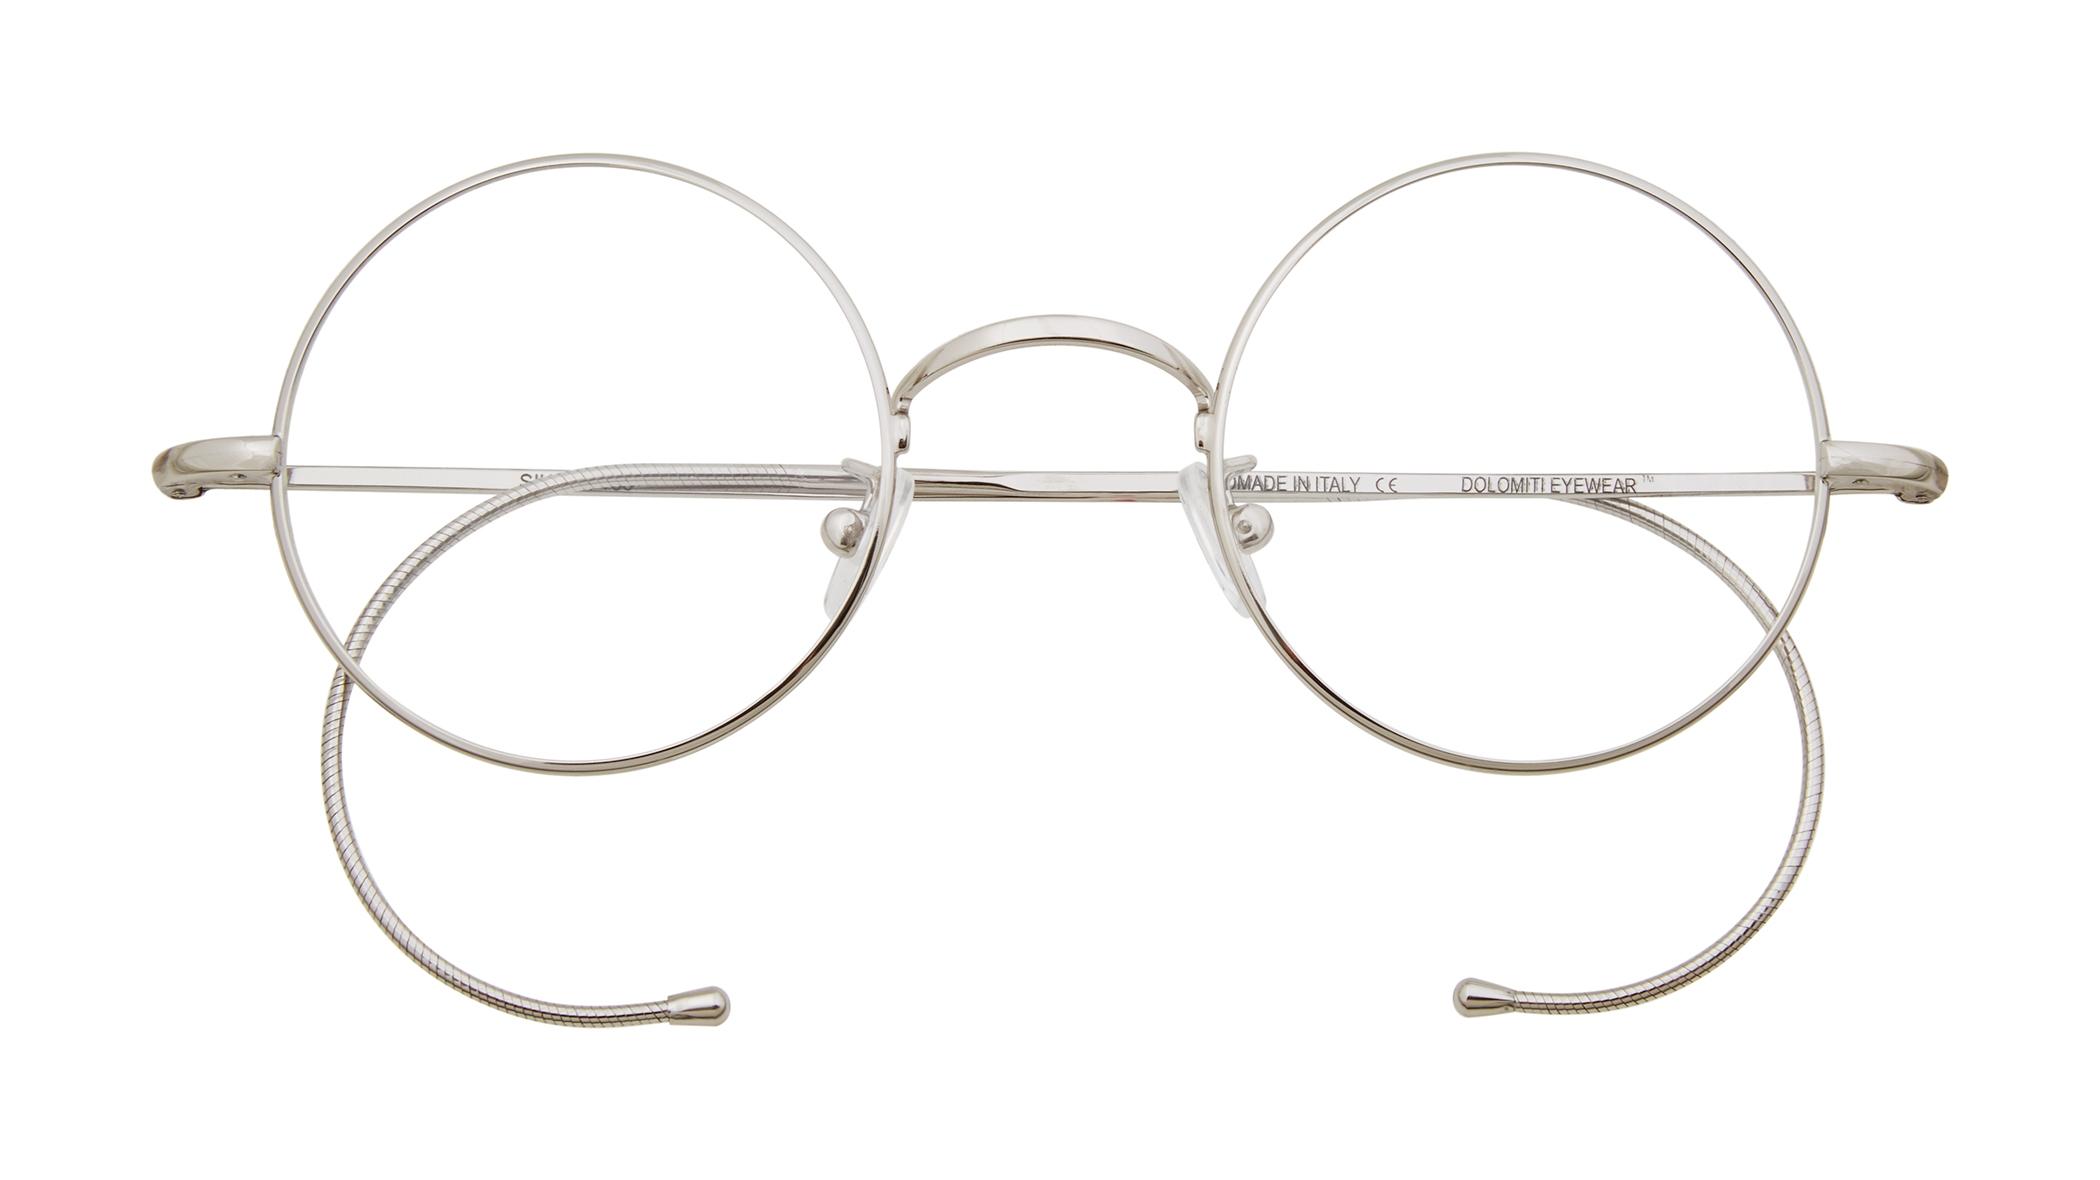 b7acea3d91d9f eyeglasses  Brand Dolomiti Eyewear Lifetime-Eyecare.com has the most ...